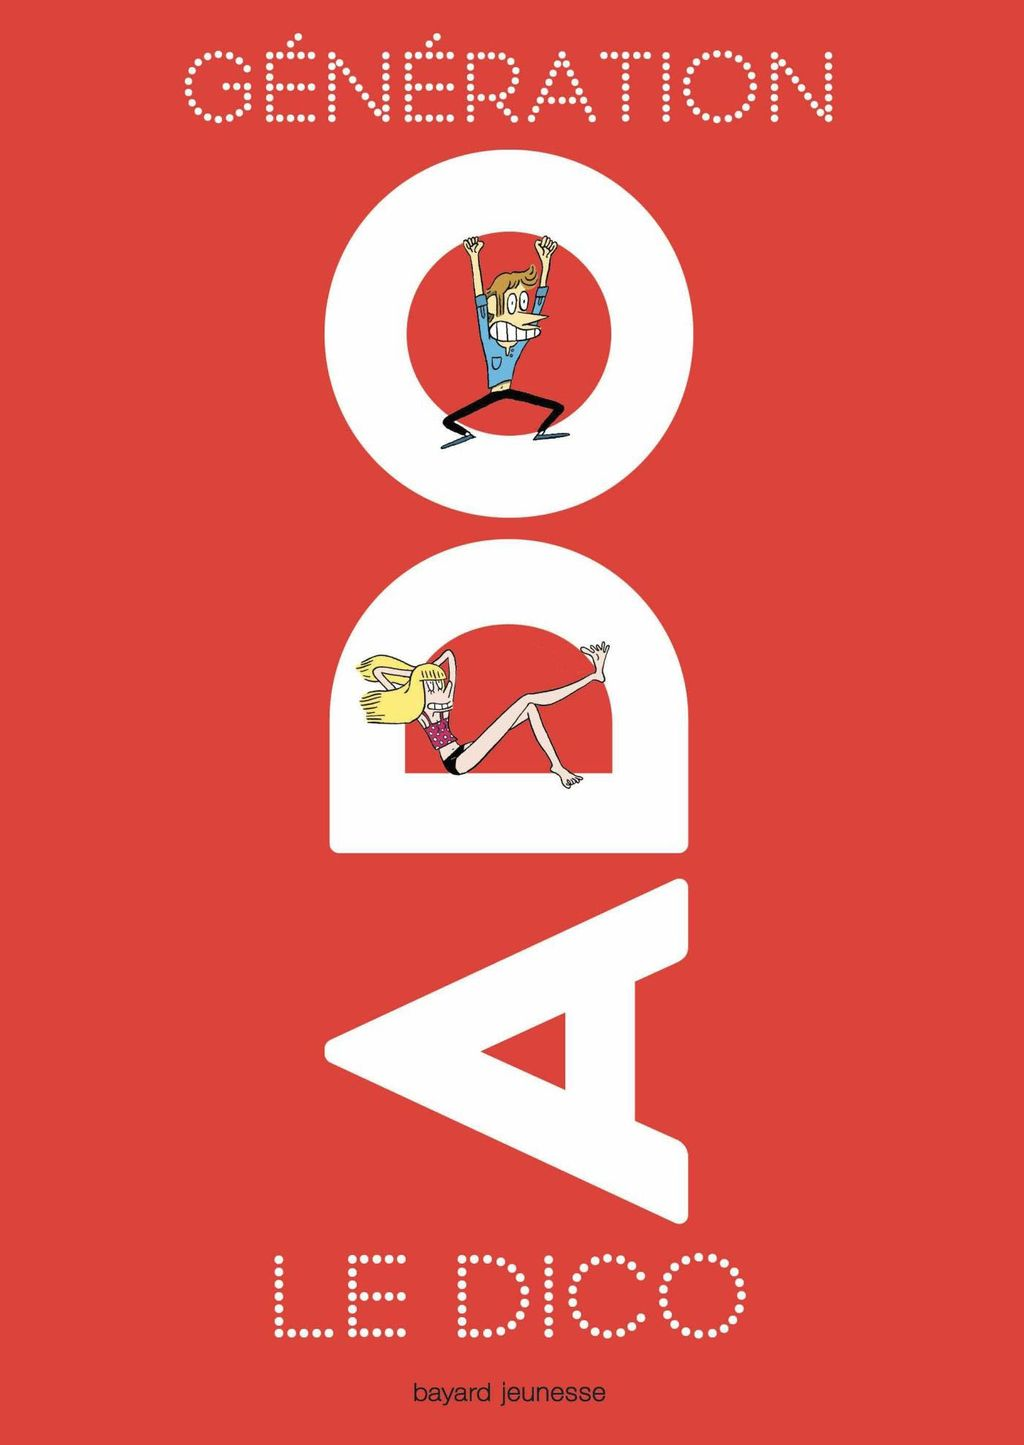 «Génération ado le dico 8e édition 2018» cover